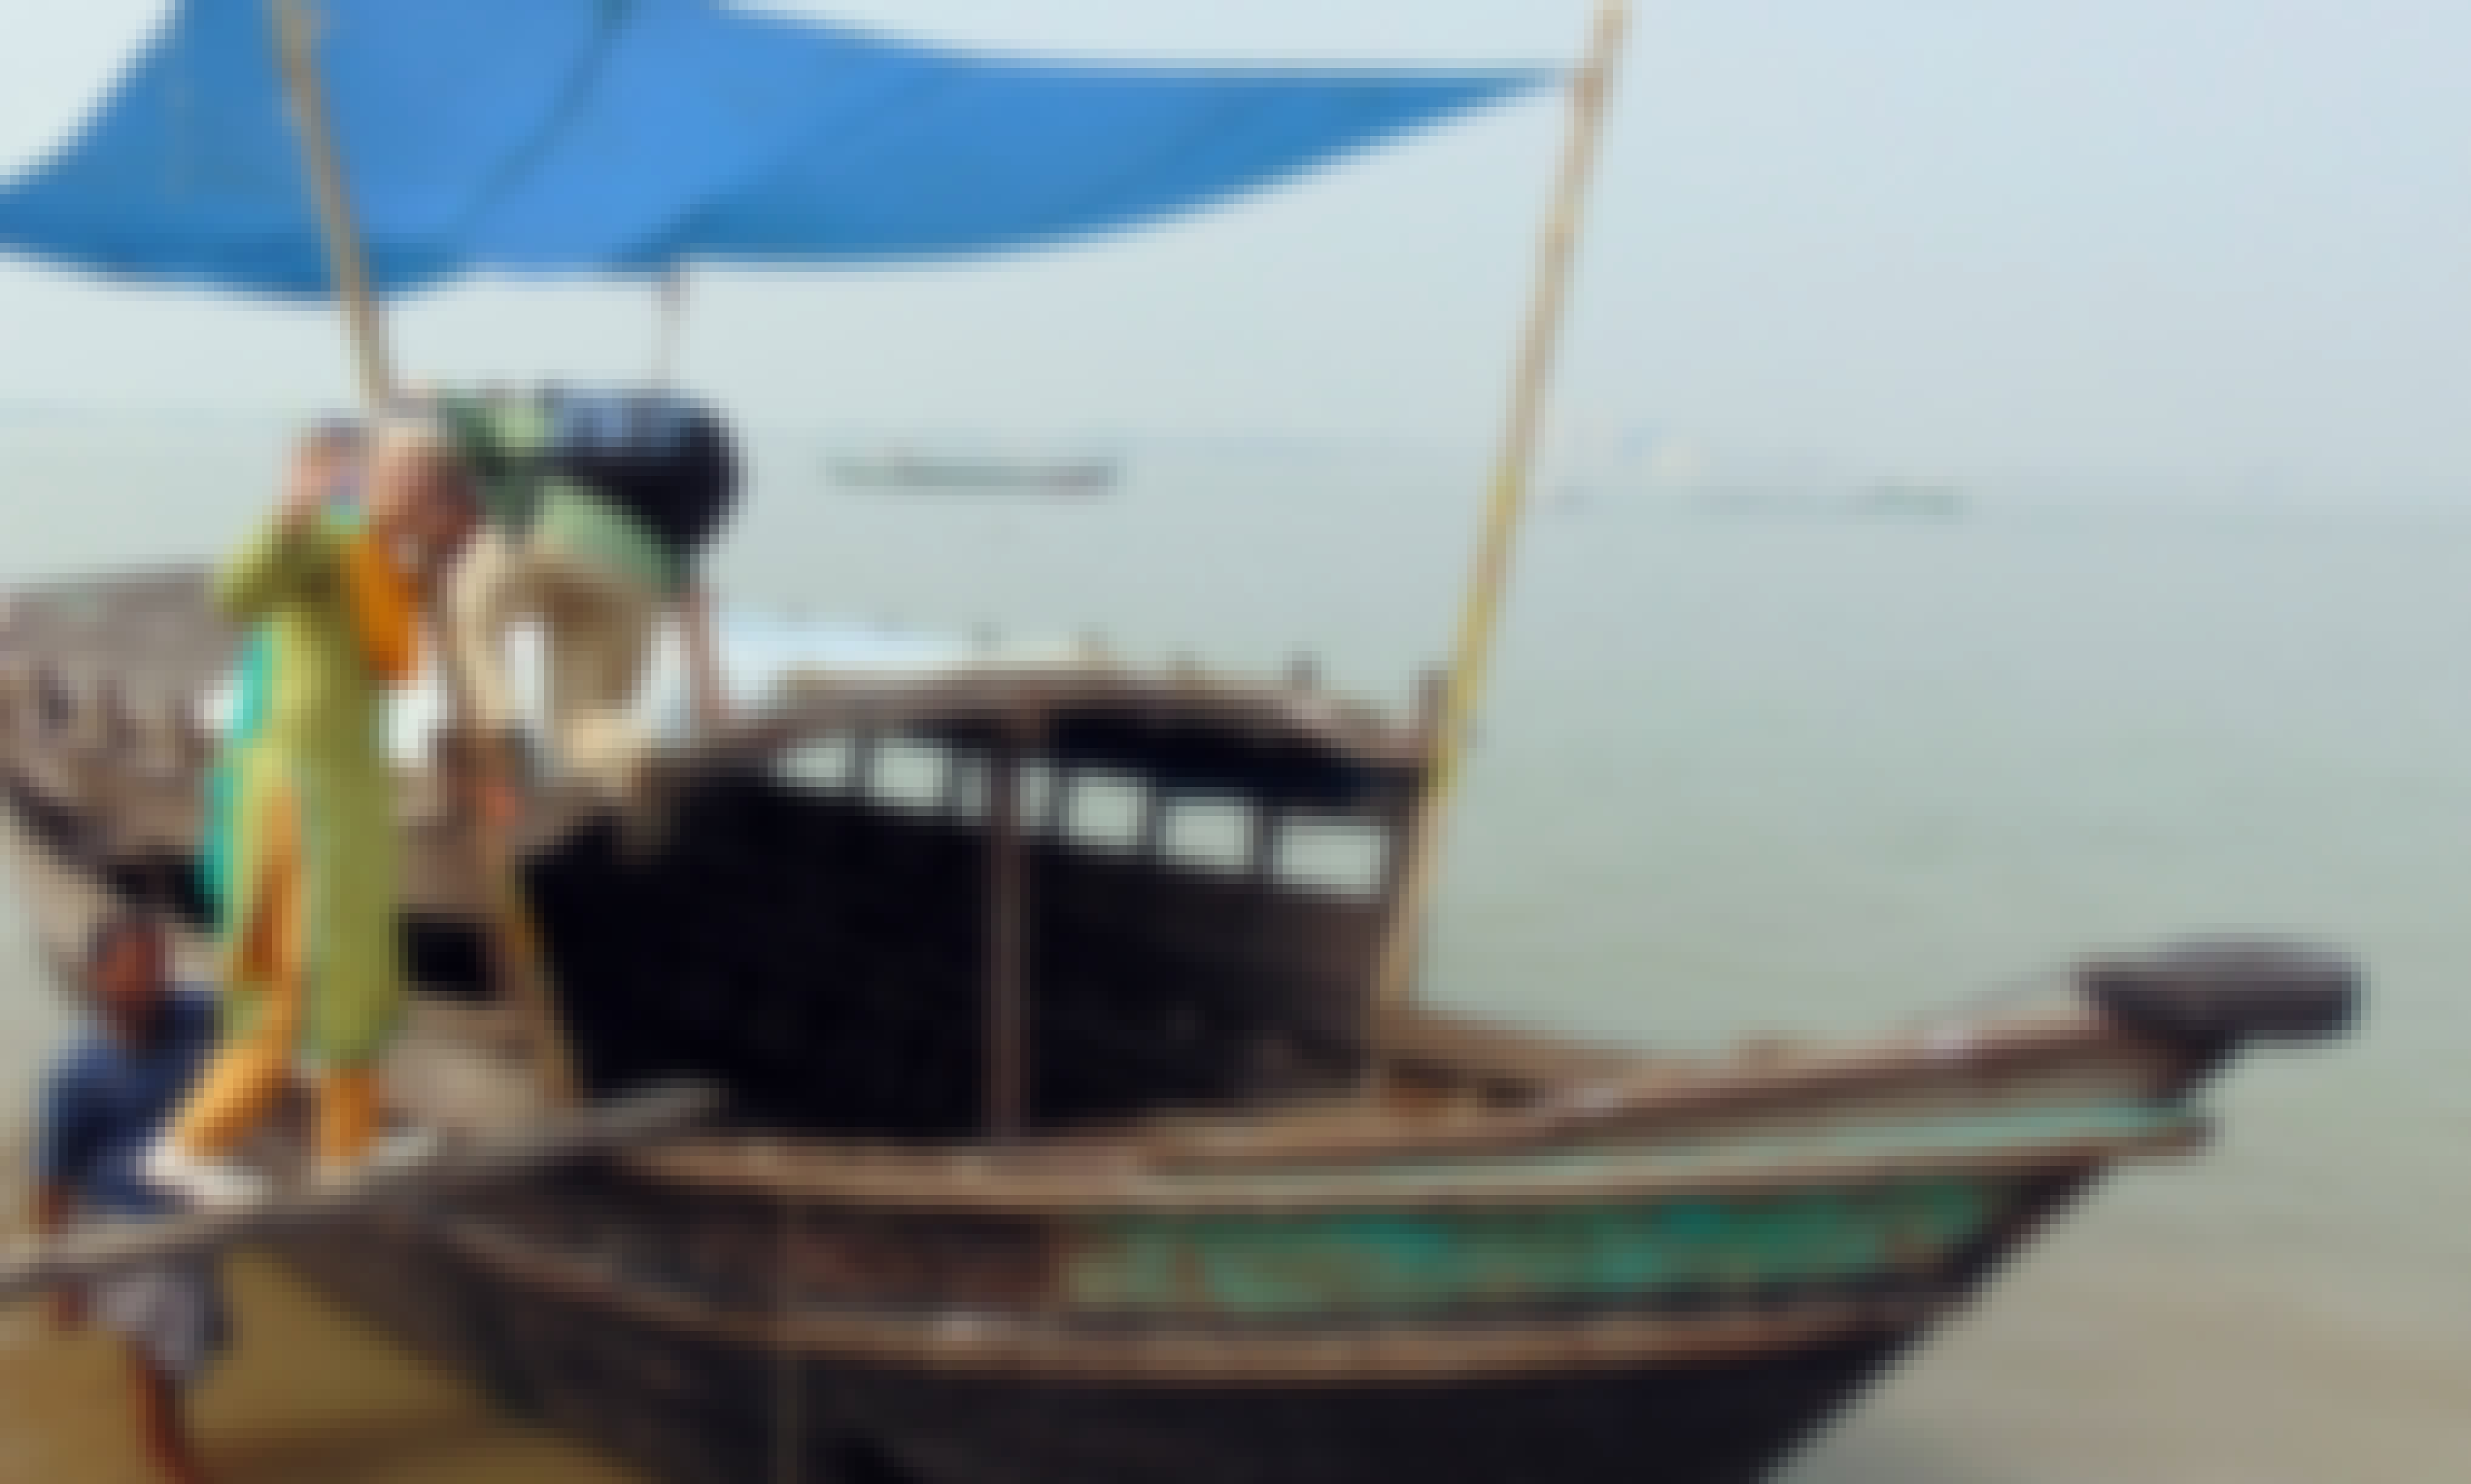 Sonargaon River Cruise and Sightseeing Tour in Bangladesh